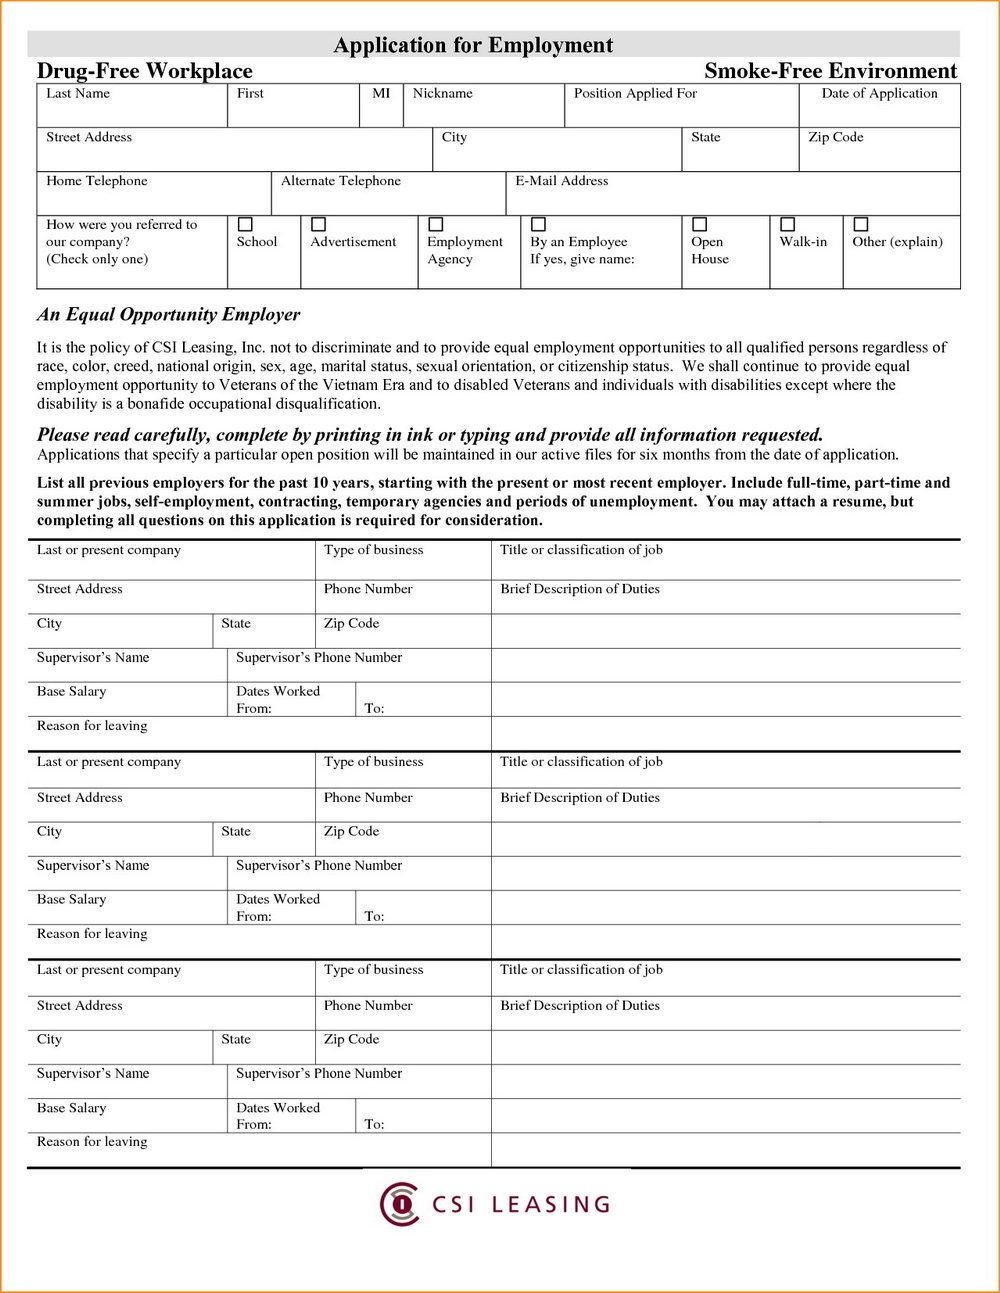 Free Printable Job Applications Forms